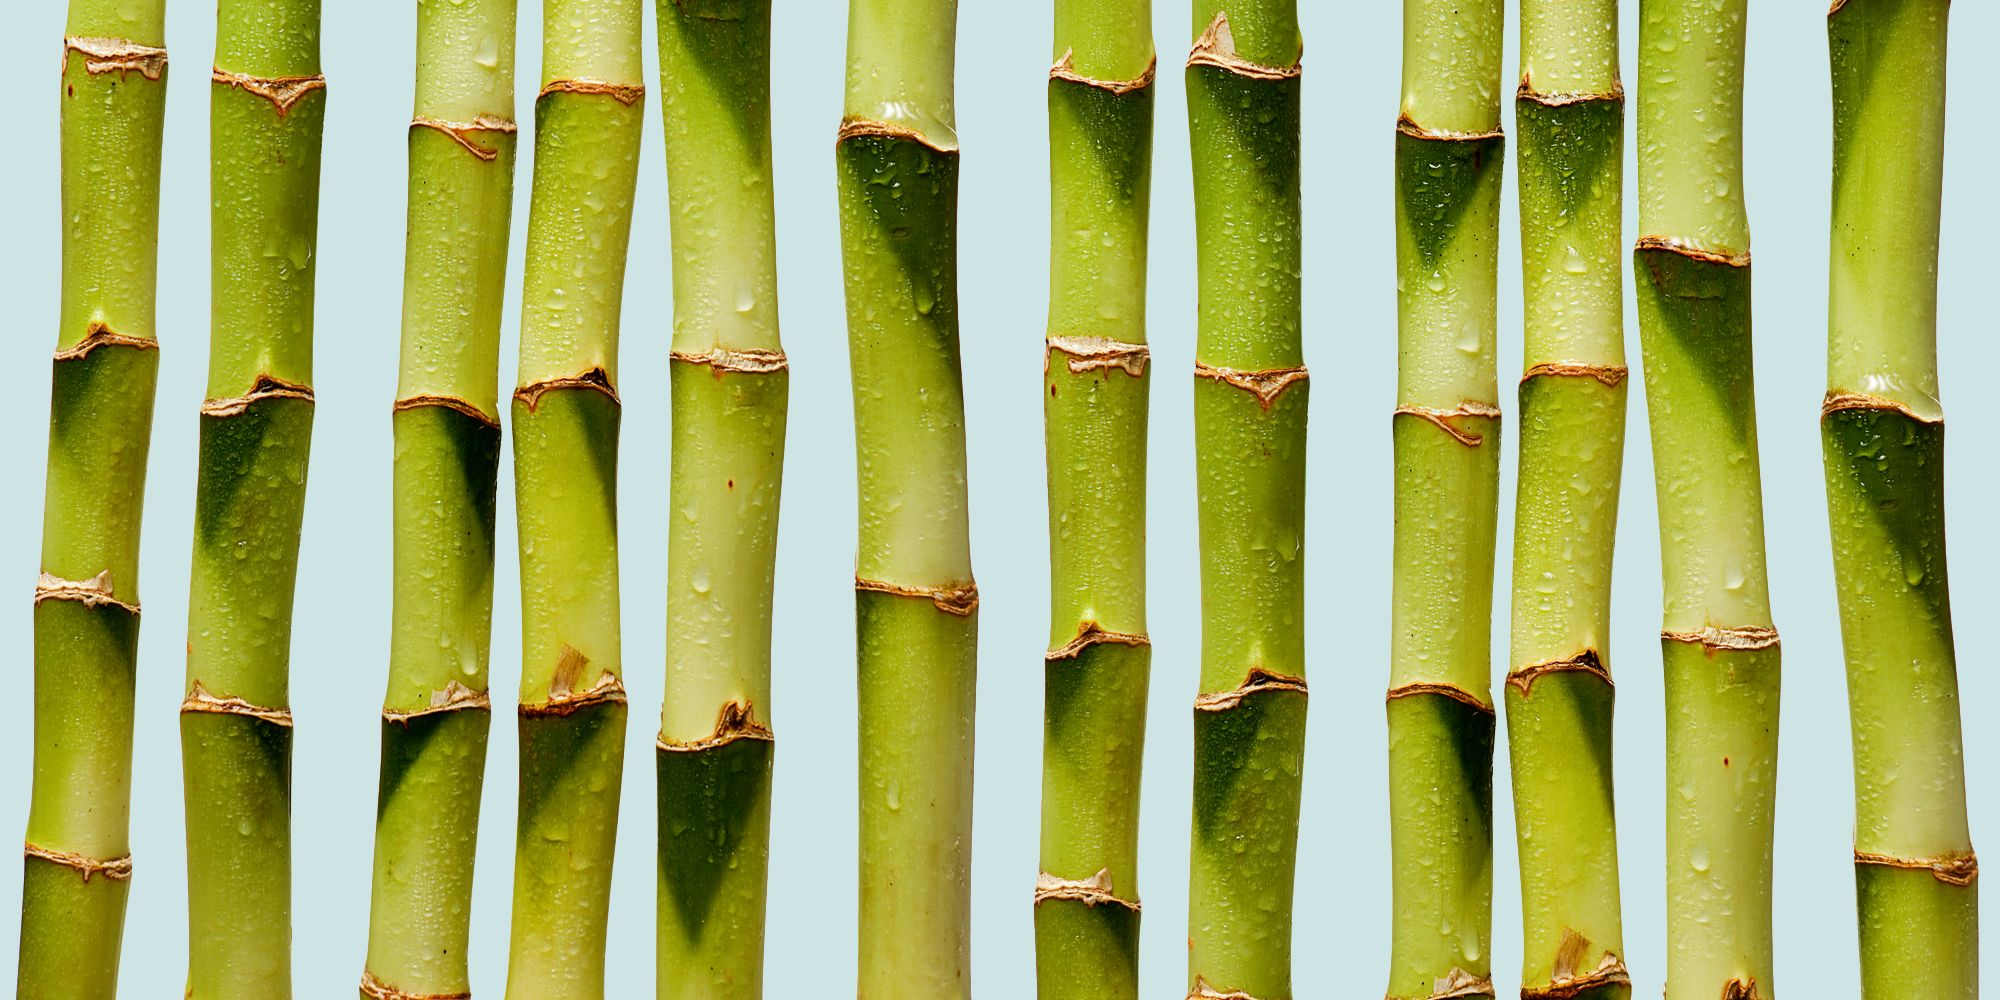 Banbu Porn bamboo water nutrient - bamboo health water